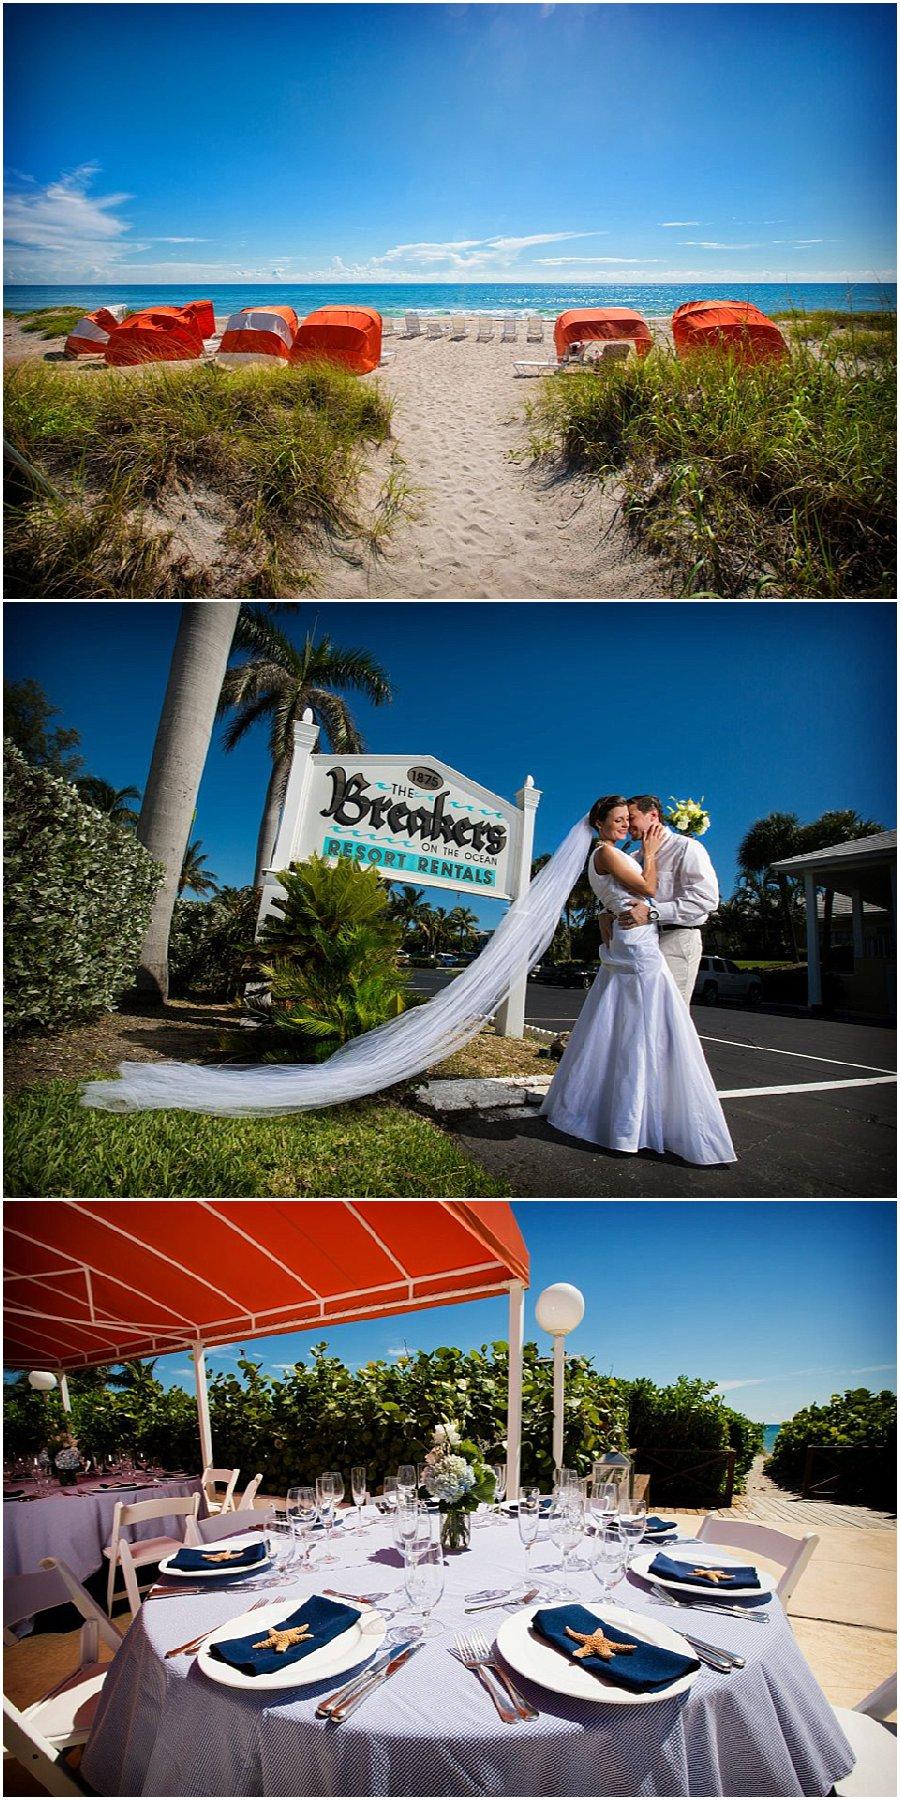 Beach Wedding Venue_Delray Breakers on the Ocean